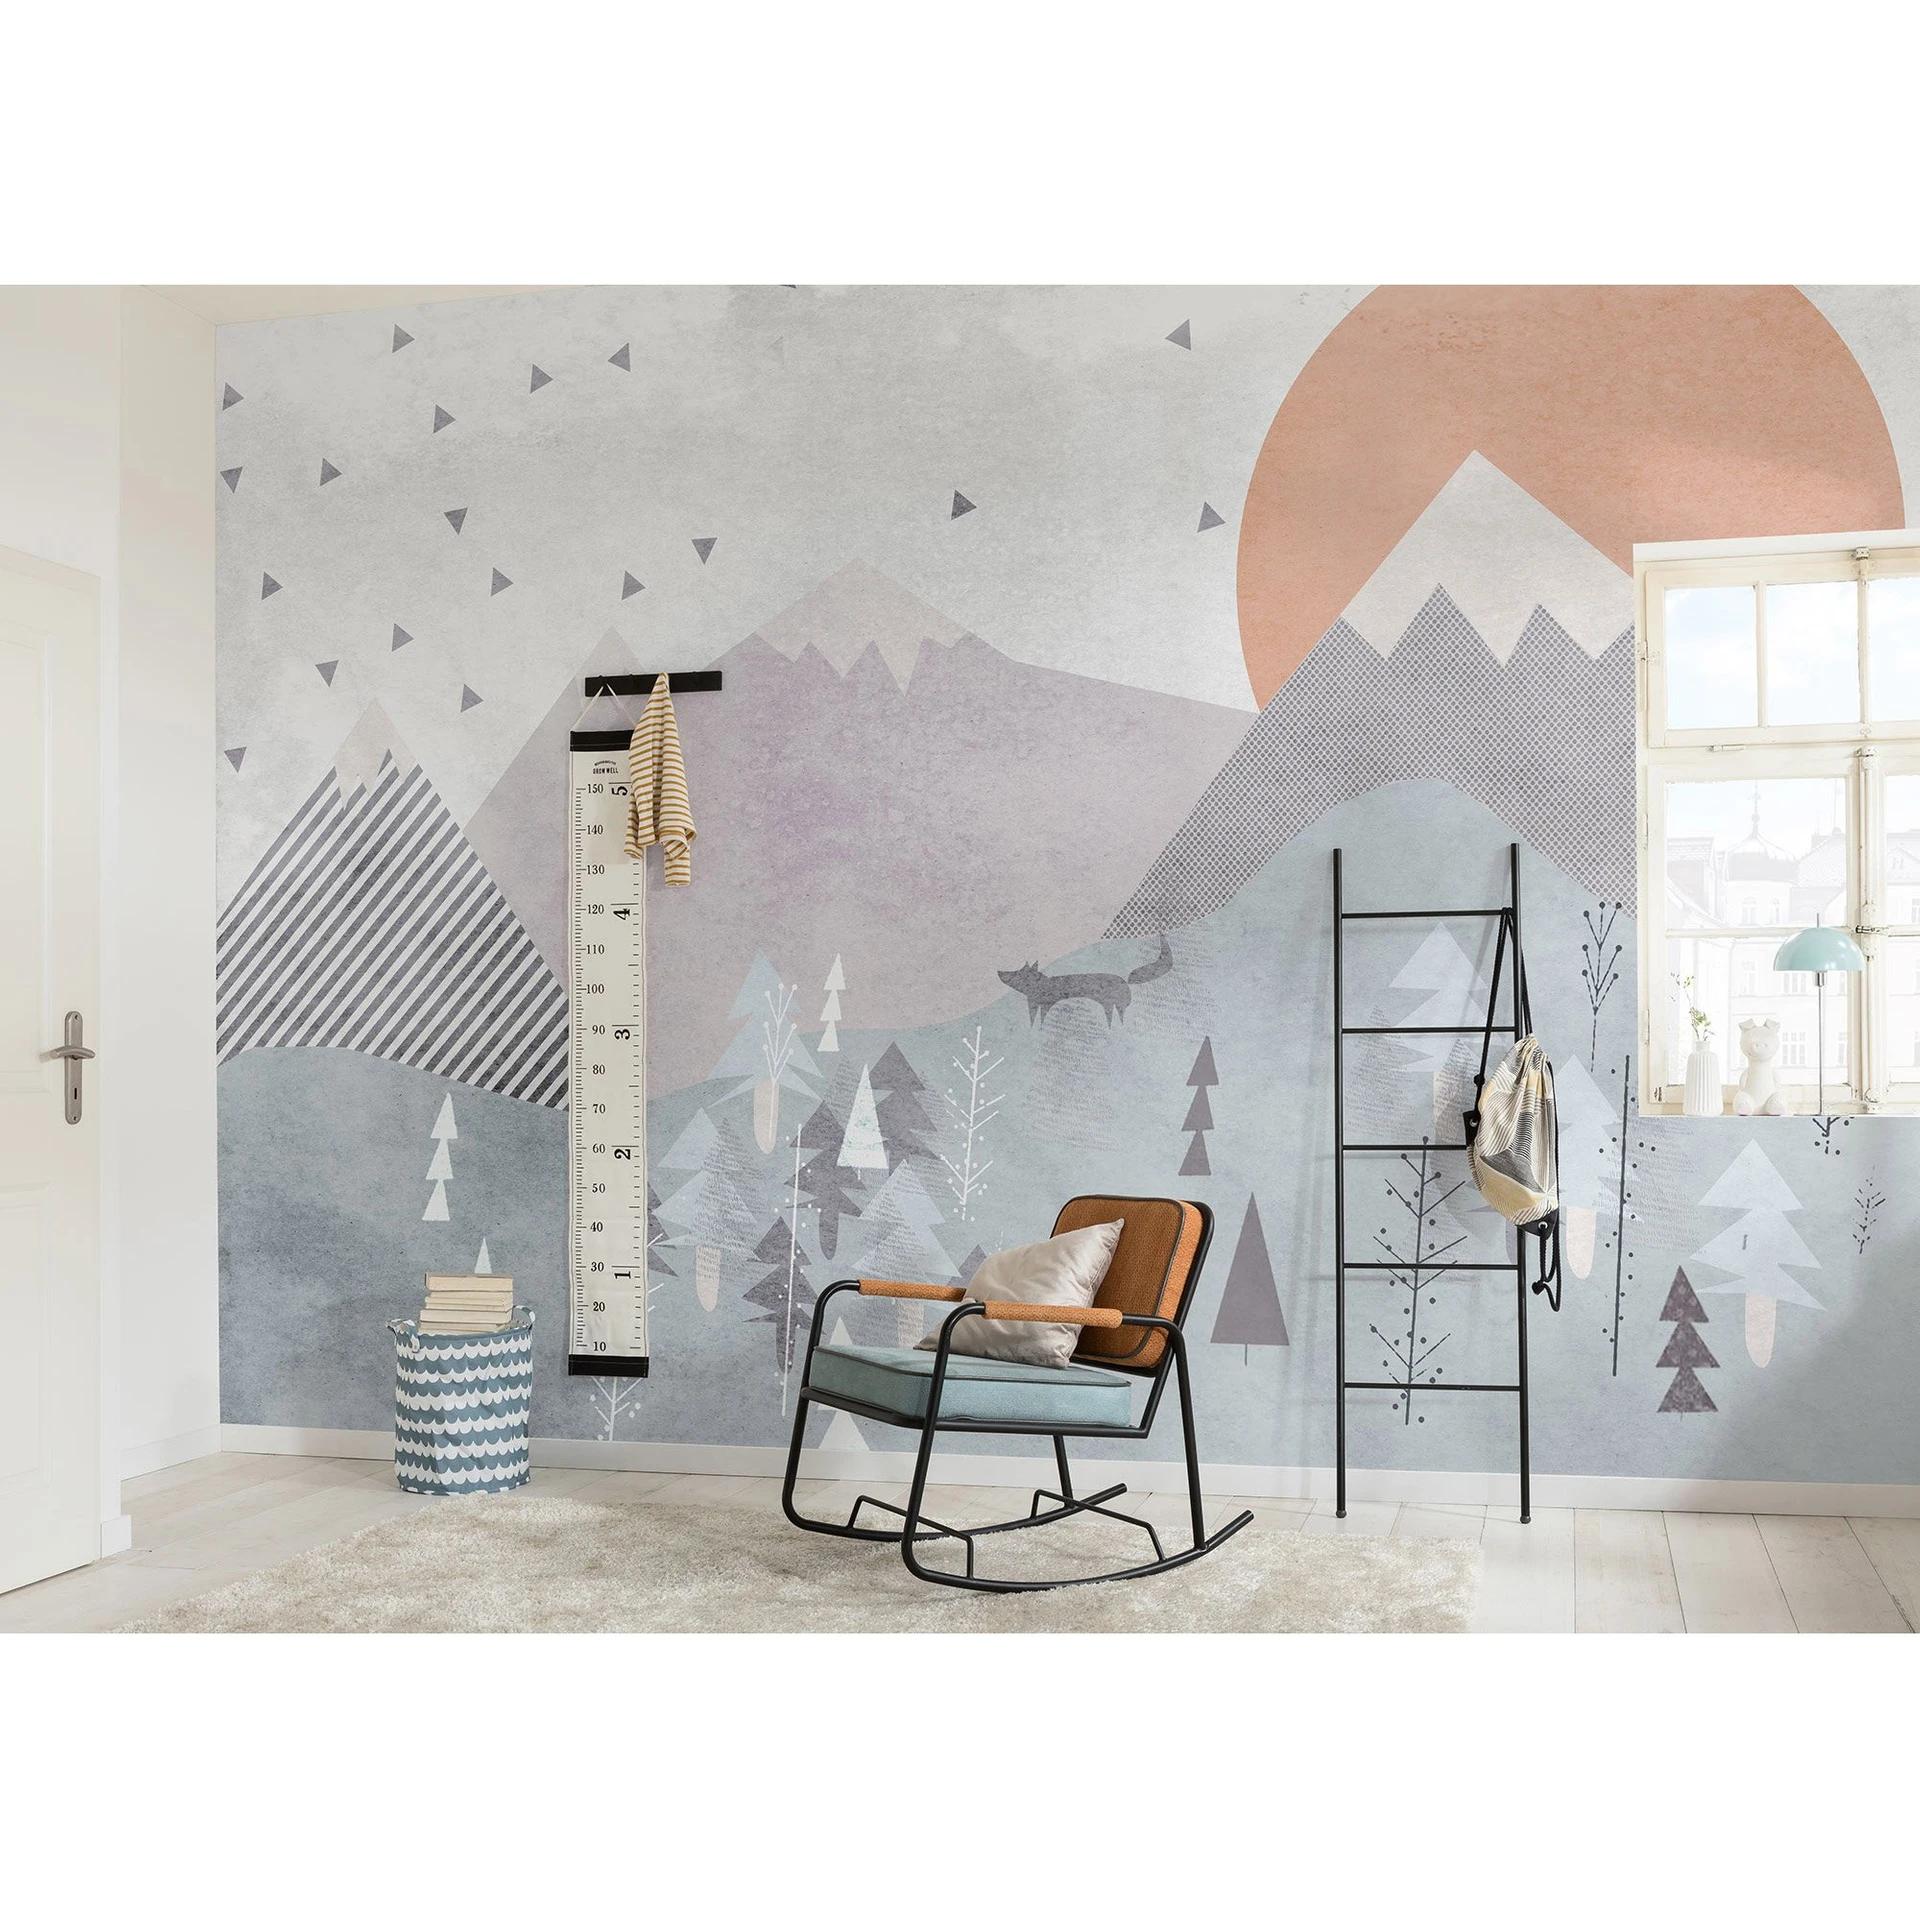 Photo Murale Wild Free Komar L 400 X H 250 Cm Leroy Merlin Mural Wallpaper Normal Wallpaper Wall Wallpaper